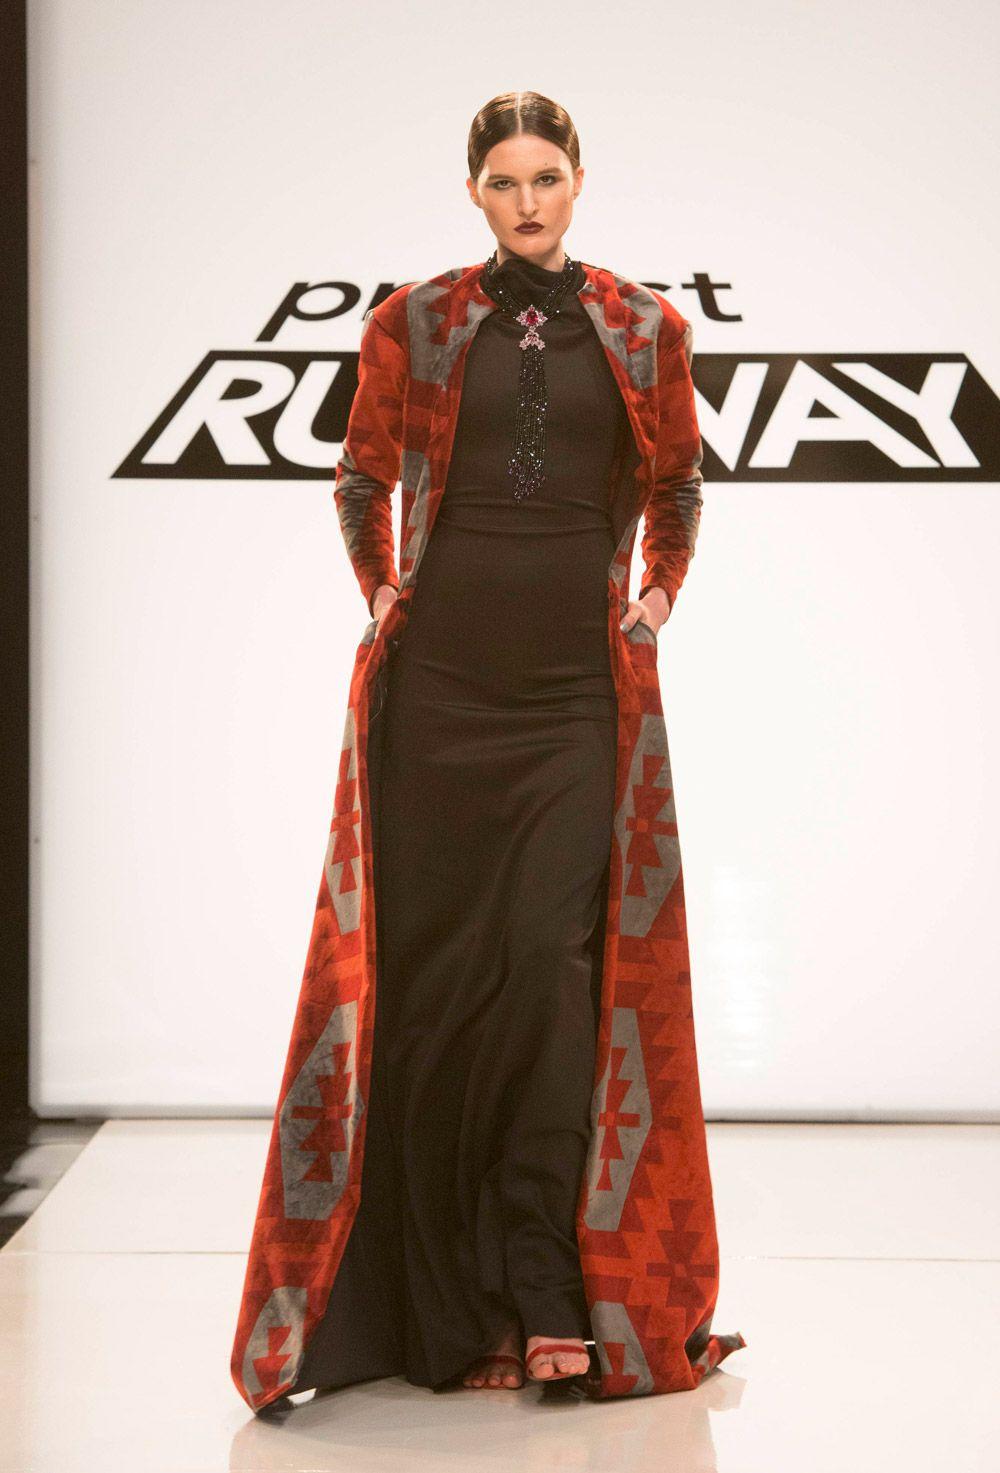 Project runway season korina emmerich episode look project